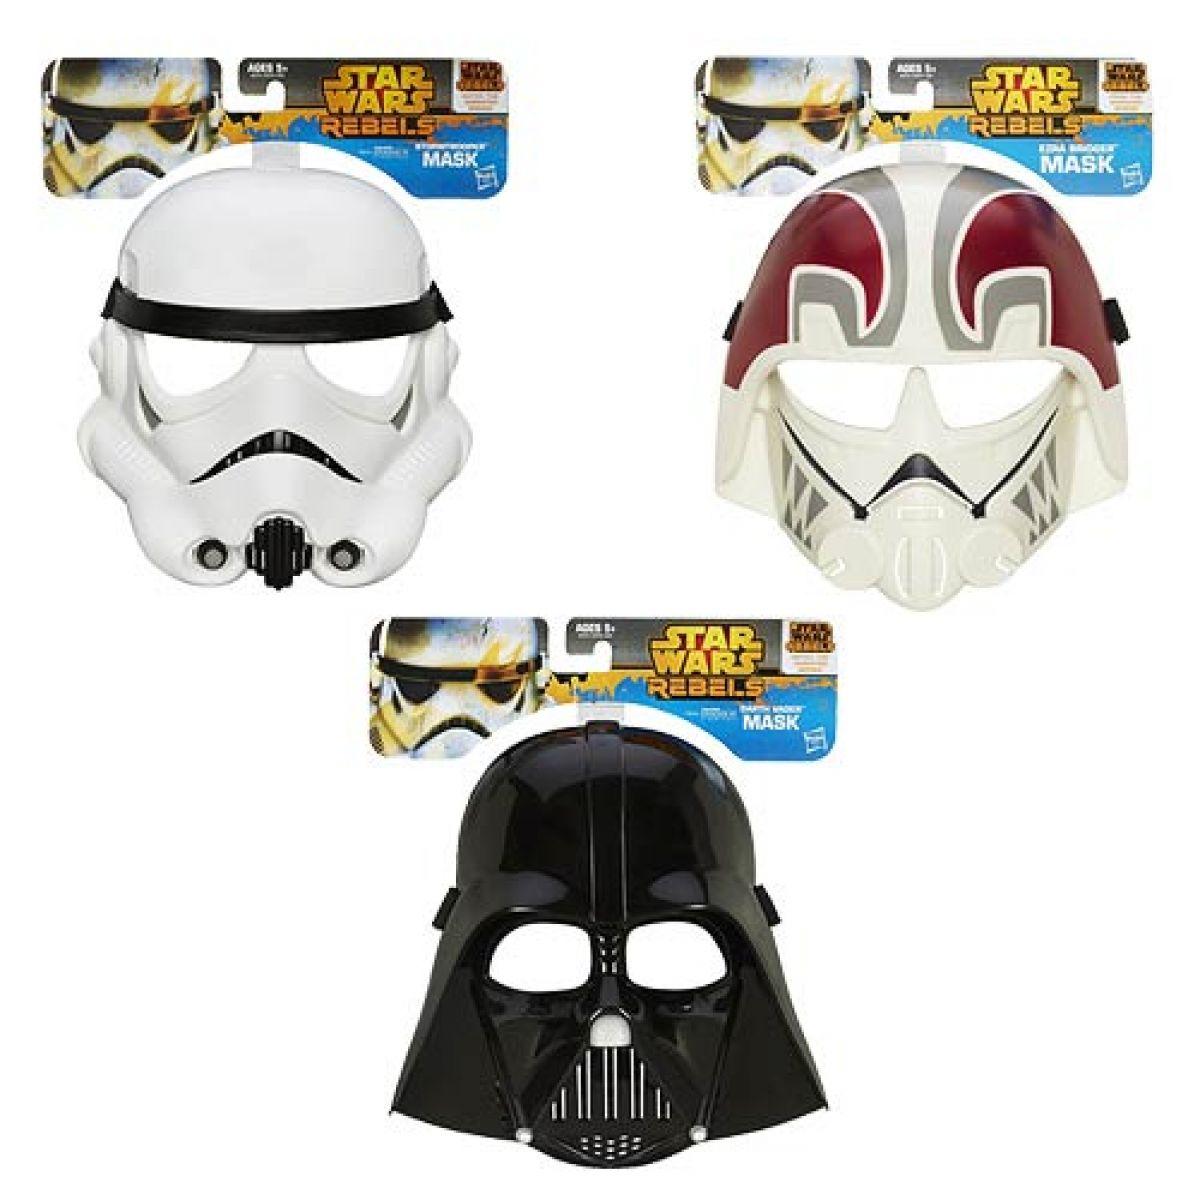 Hasbro Star Wars rebelská maska - Ezra Bridger #2